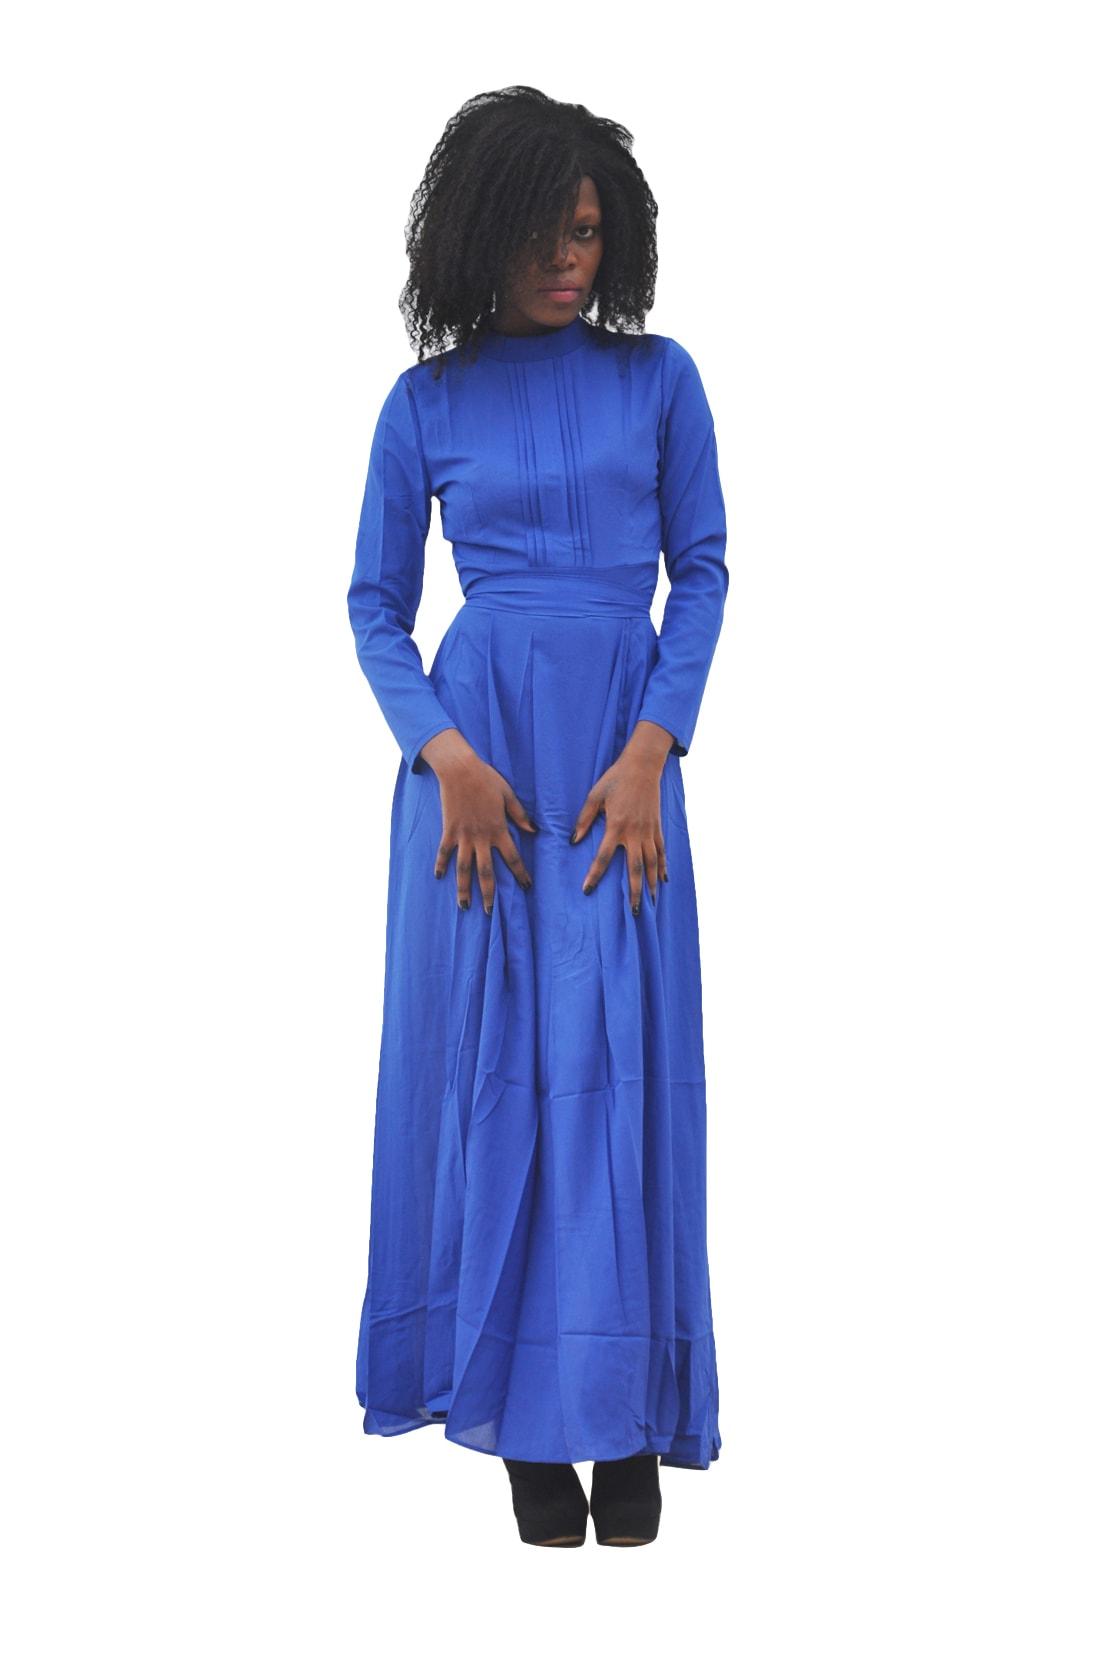 M0293 blue1 Long Sleeve Dresses maureens.com boutique